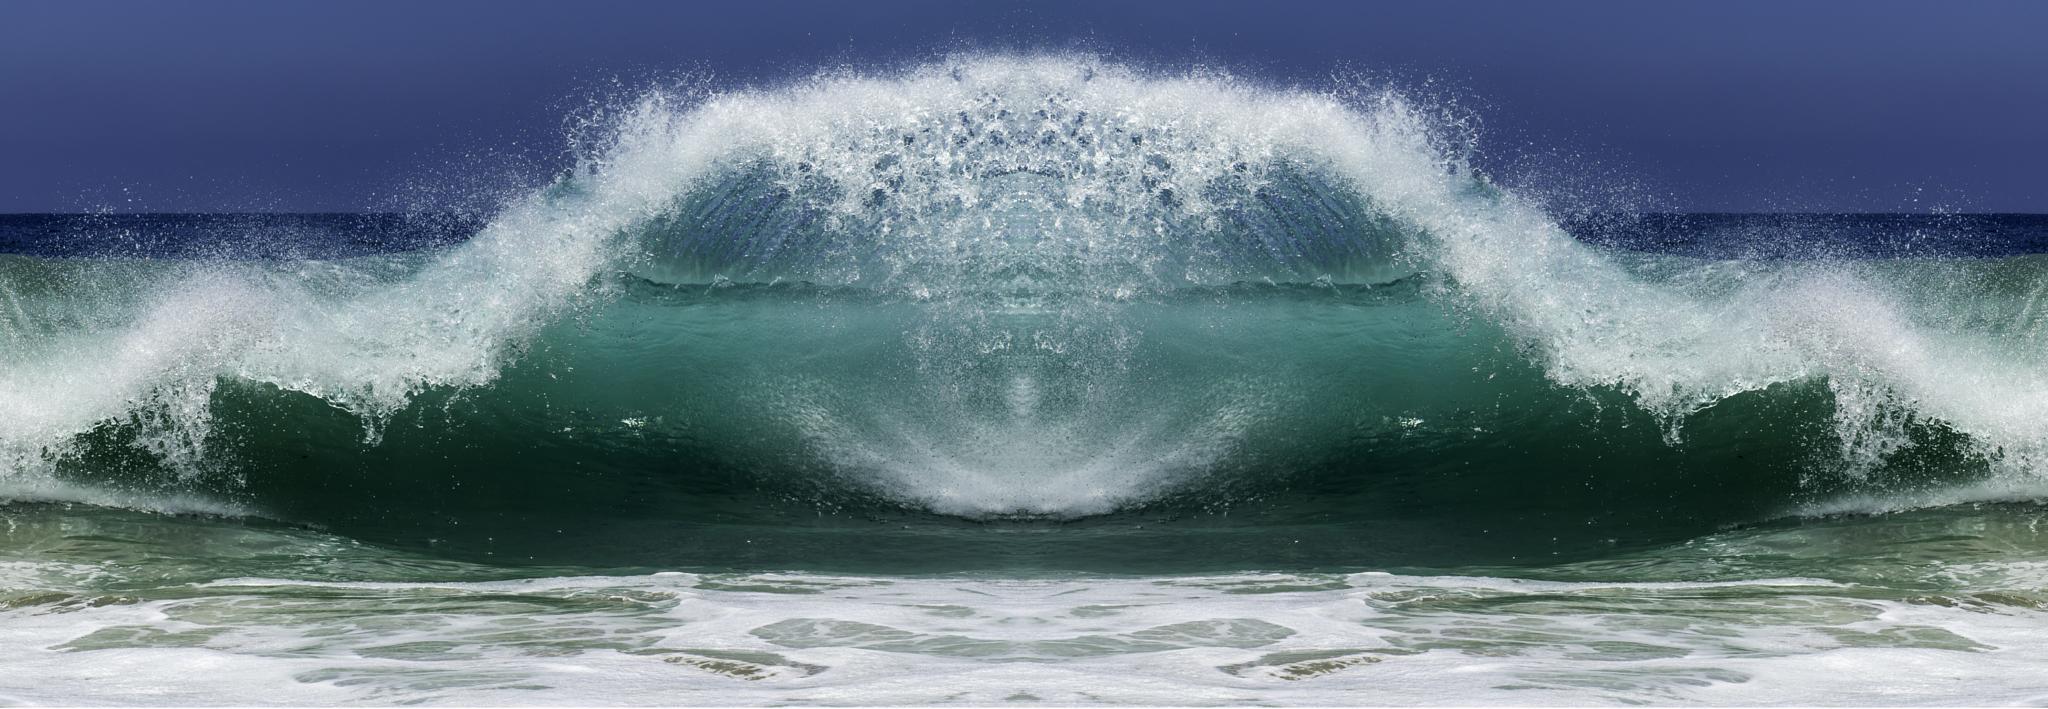 Splash by pbrb